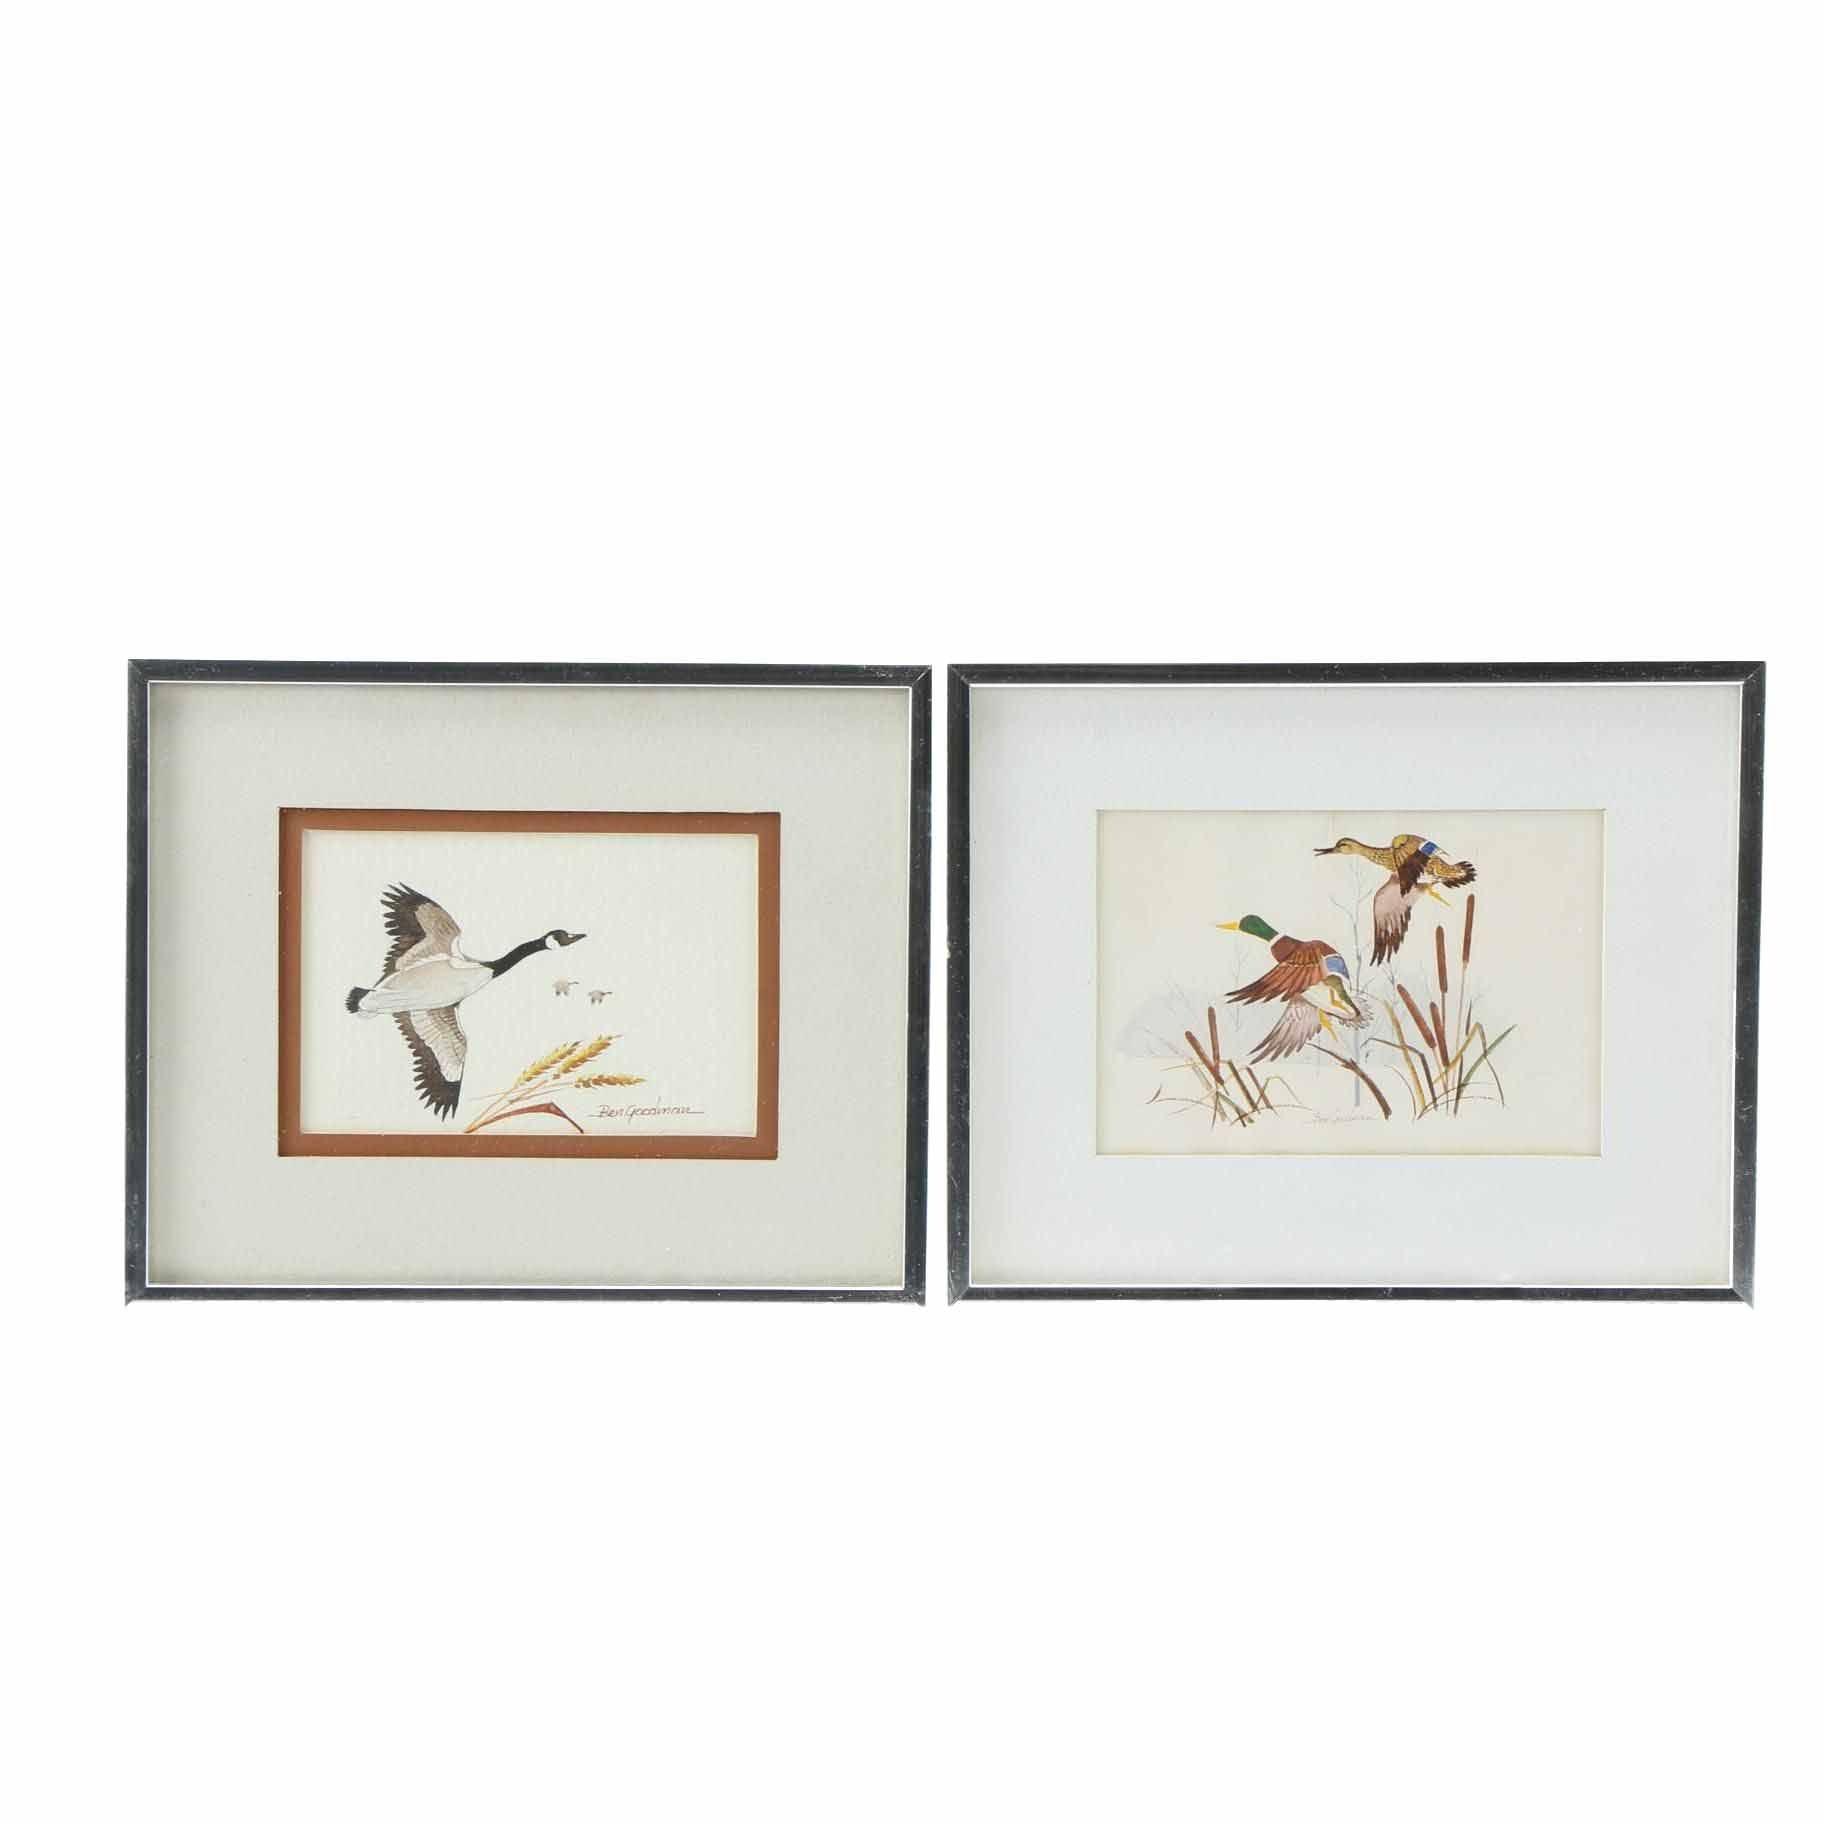 Ben Goodman Watercolors on Paper of Water Fowl